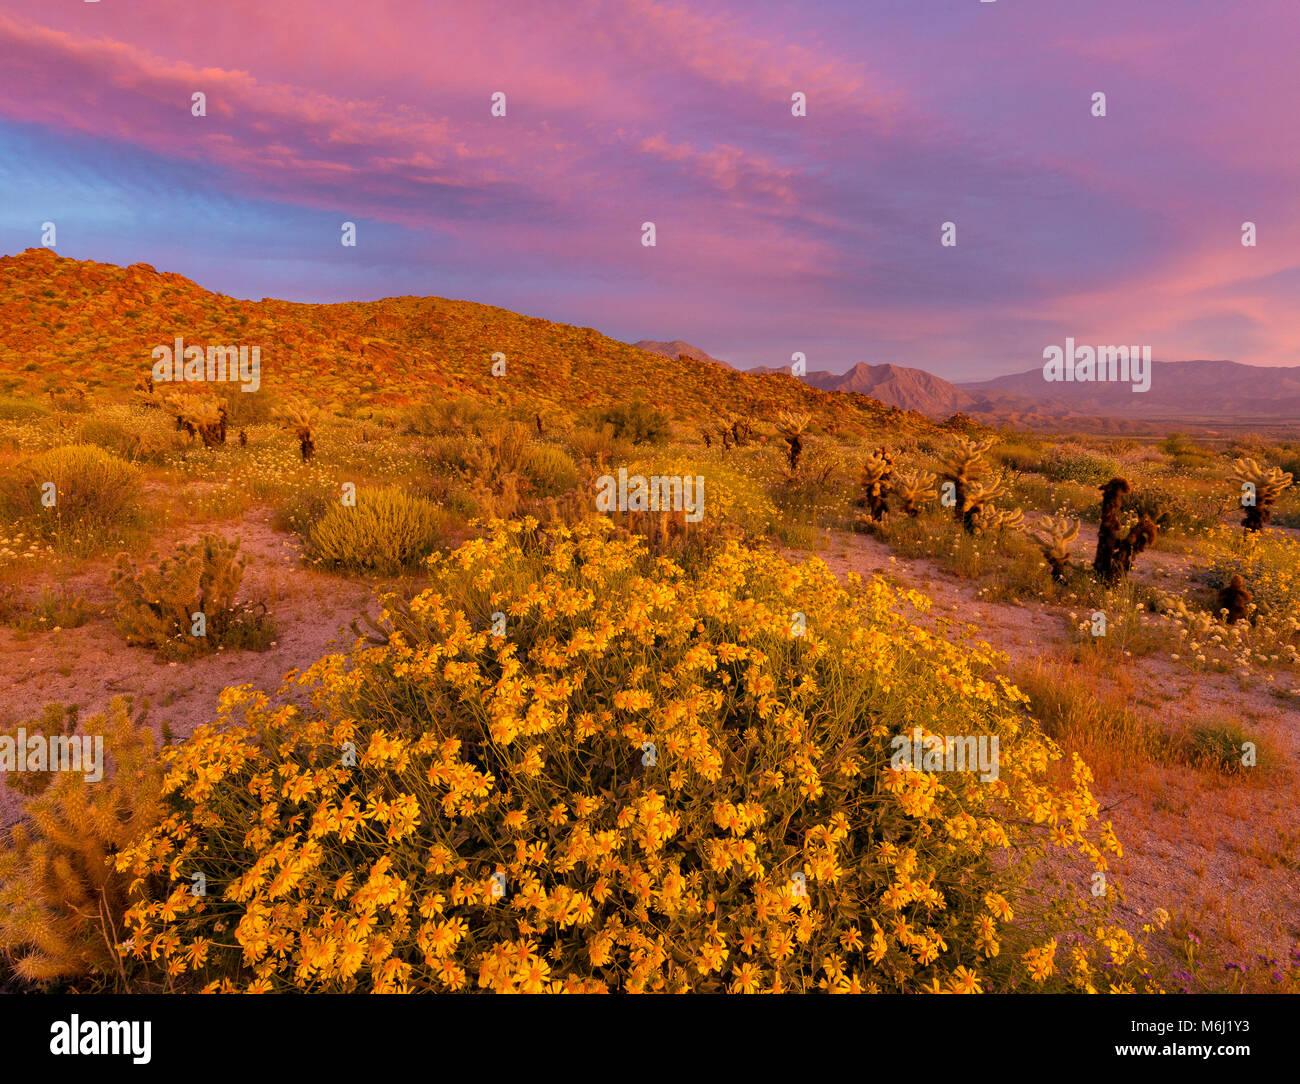 Dawn, Brittlebush, Glorietta Canyon, Anza-Borrego Desert State Park, California - Stock Image